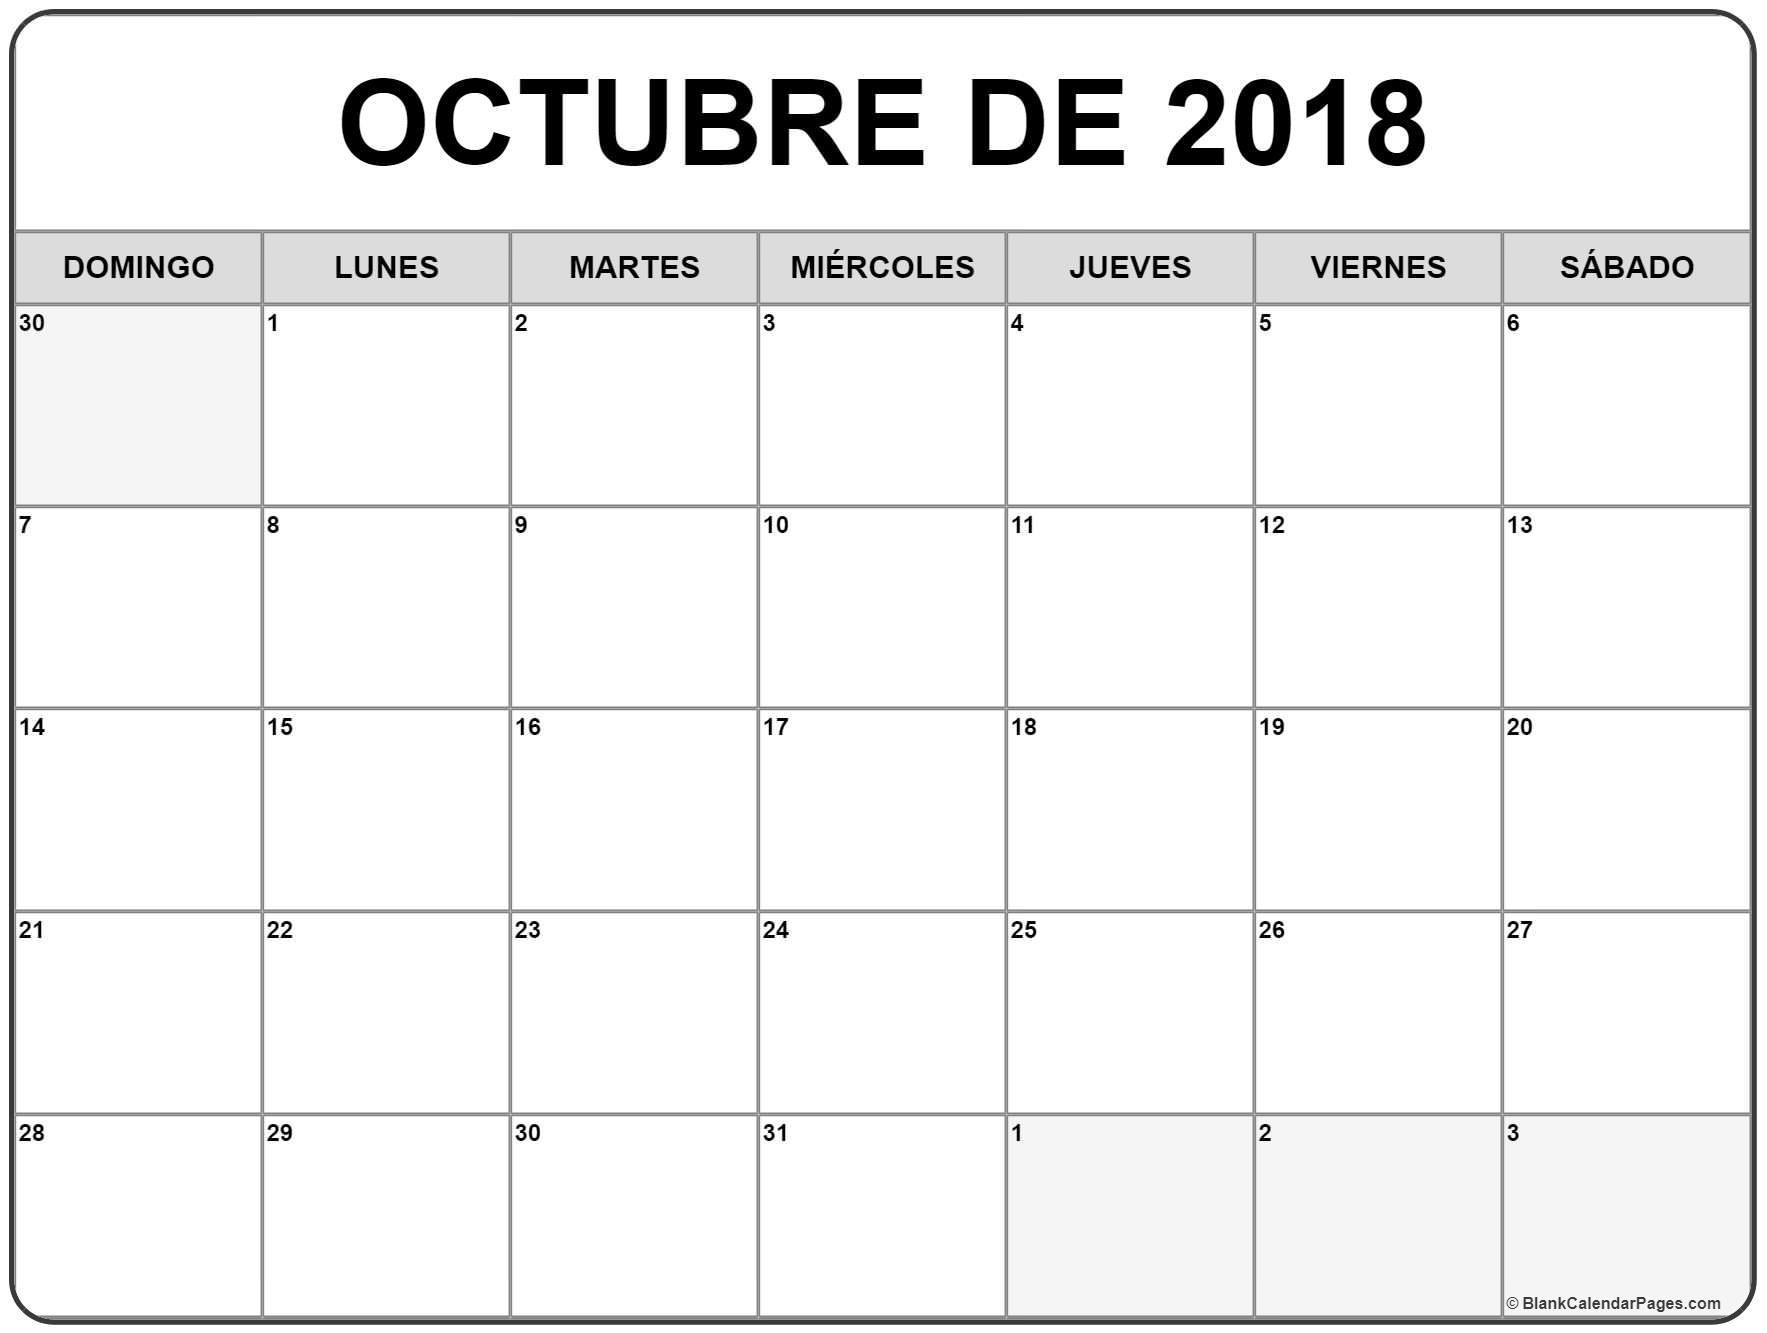 Octubre 2018 Calendario 16